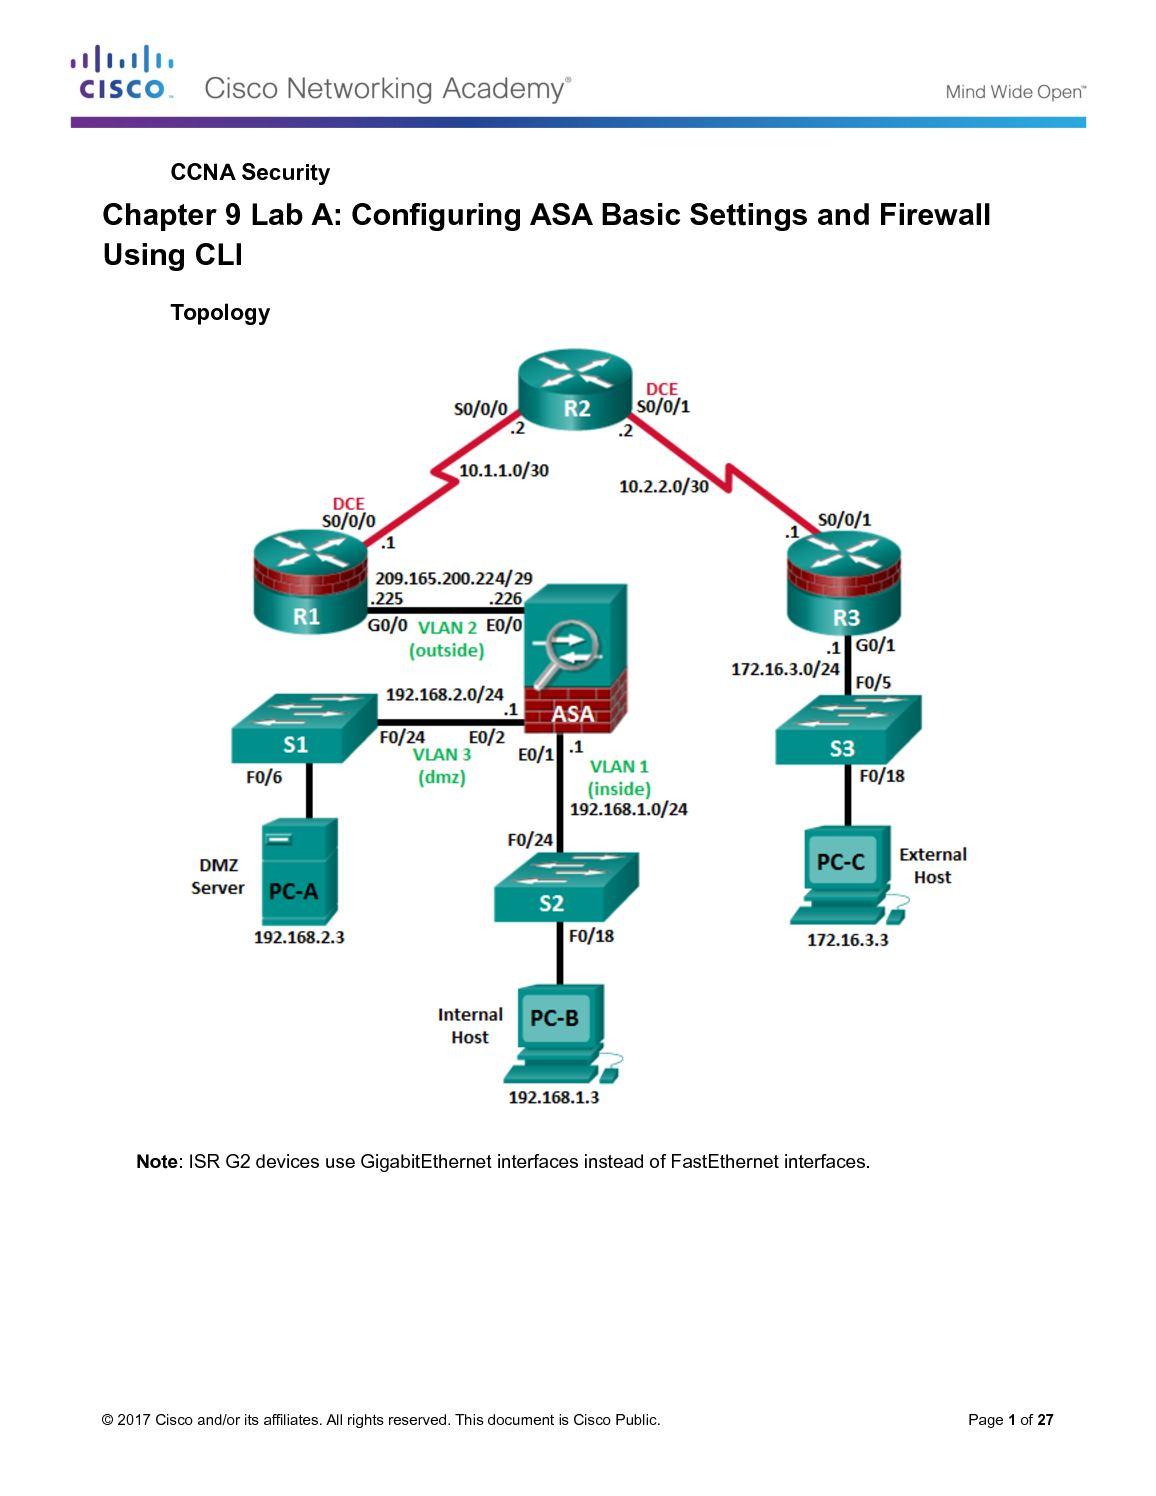 Calaméo - 9 3 1 2 Lab Configure Asa Basic Settings And Firewall